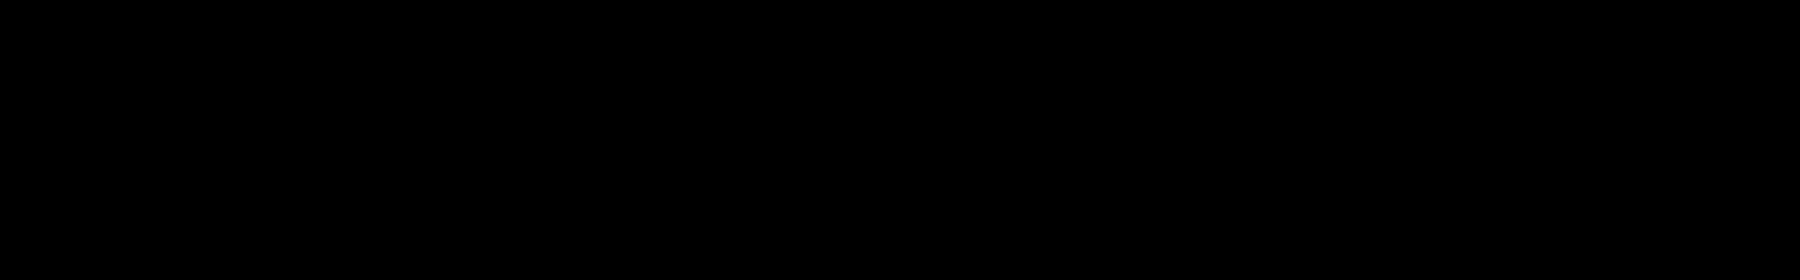 Trance Midi Ultimate Bundle 6 in 1 audio waveform